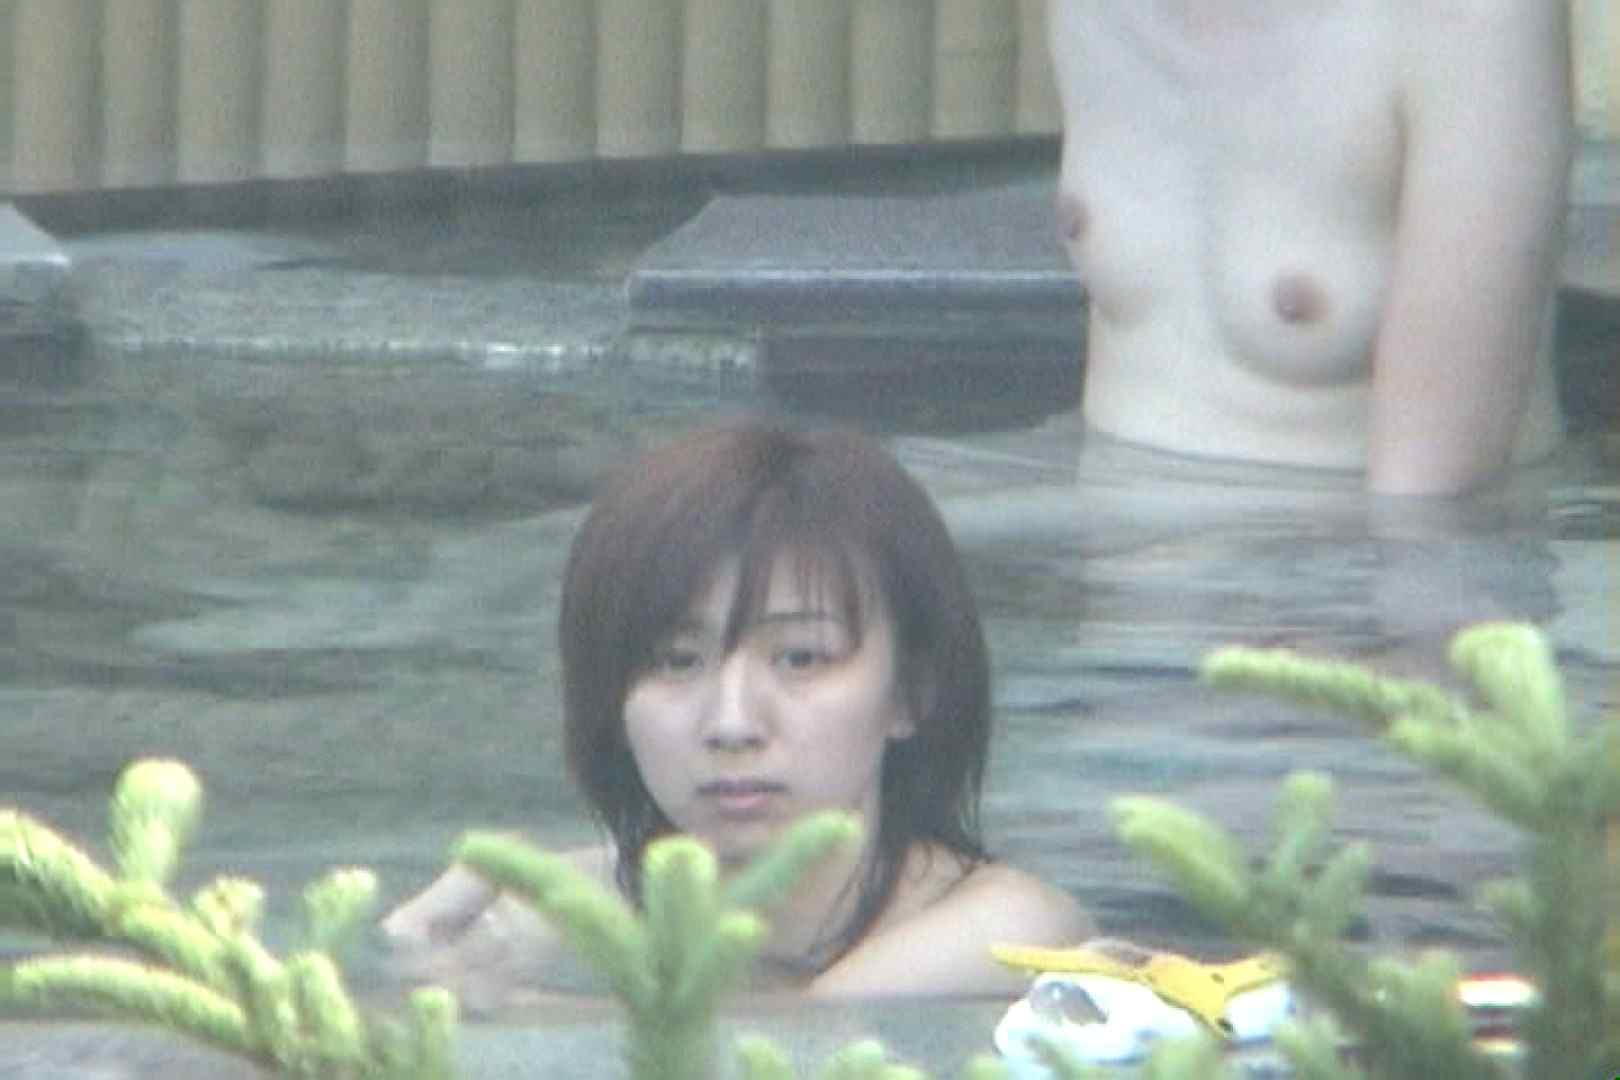 Aquaな露天風呂Vol.77【VIP限定】 盗撮   OLセックス  107画像 73